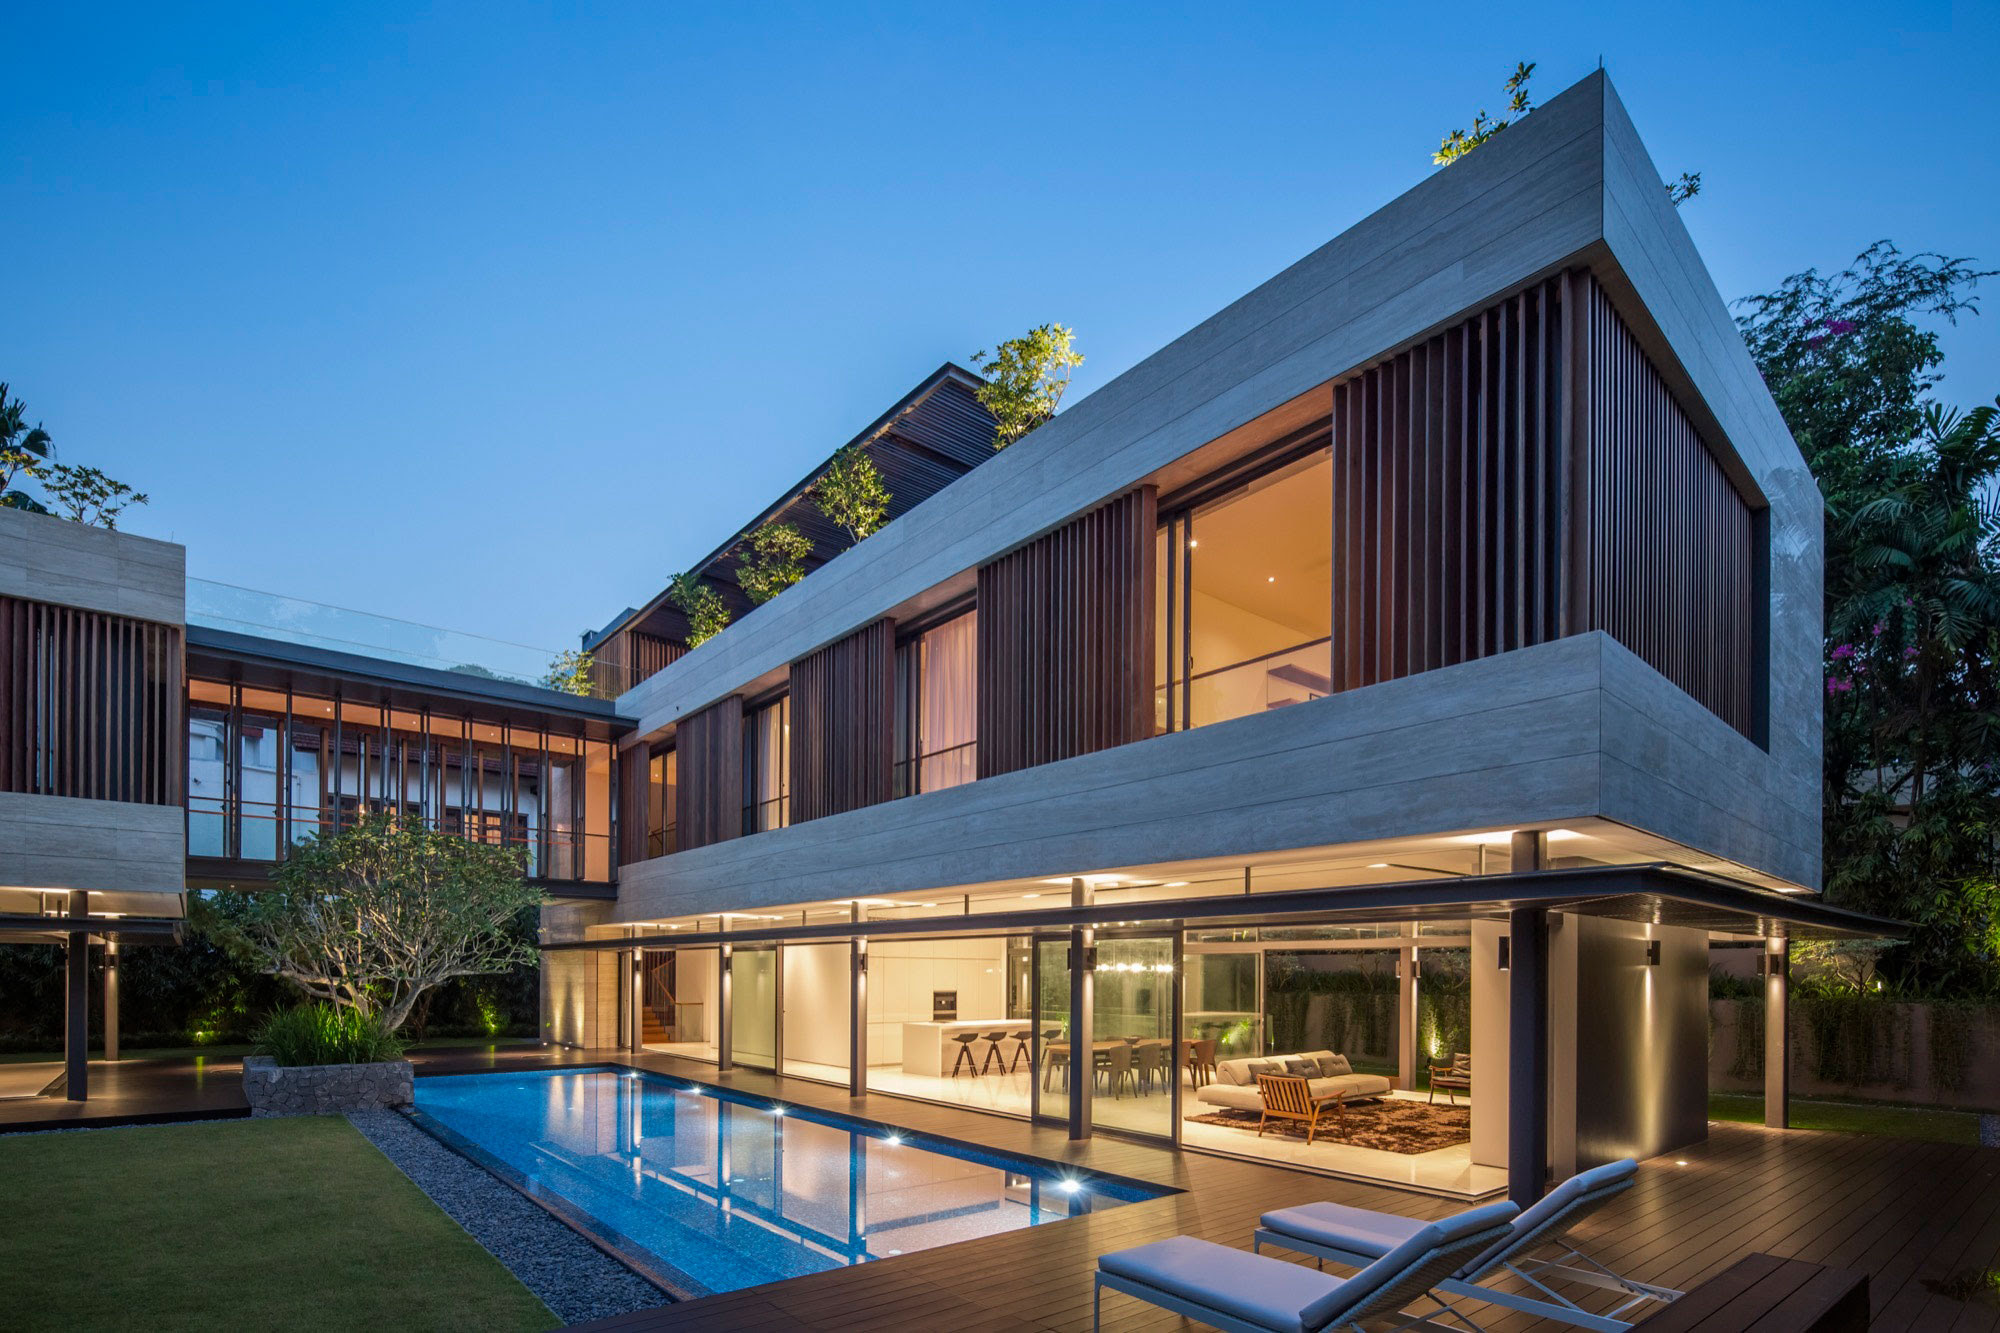 Travertine Dream House / Wallflower Architecture + Design | Design ...